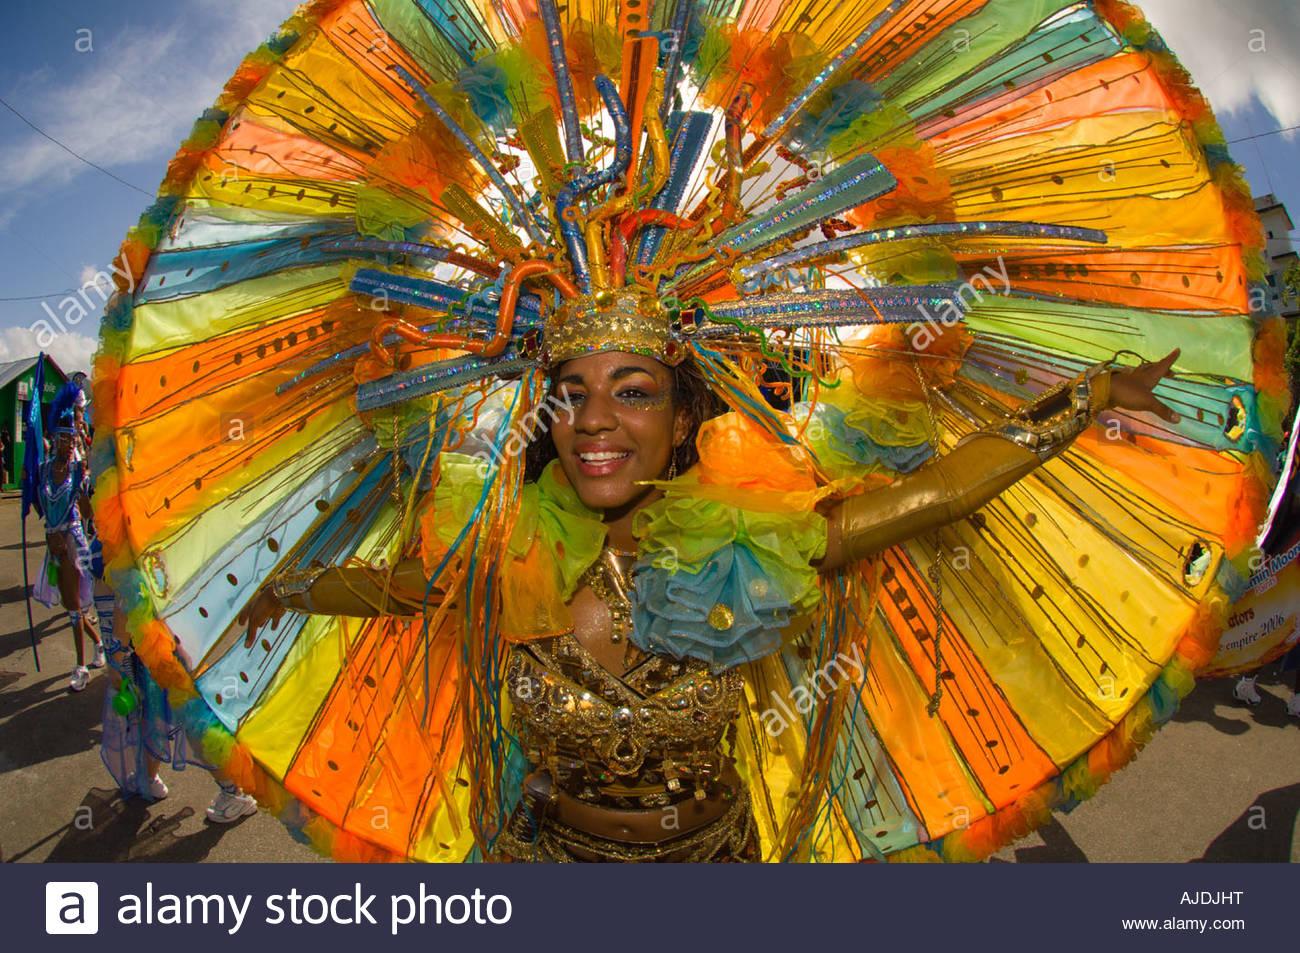 woman-wearing-ornate-carnival-costume-qu